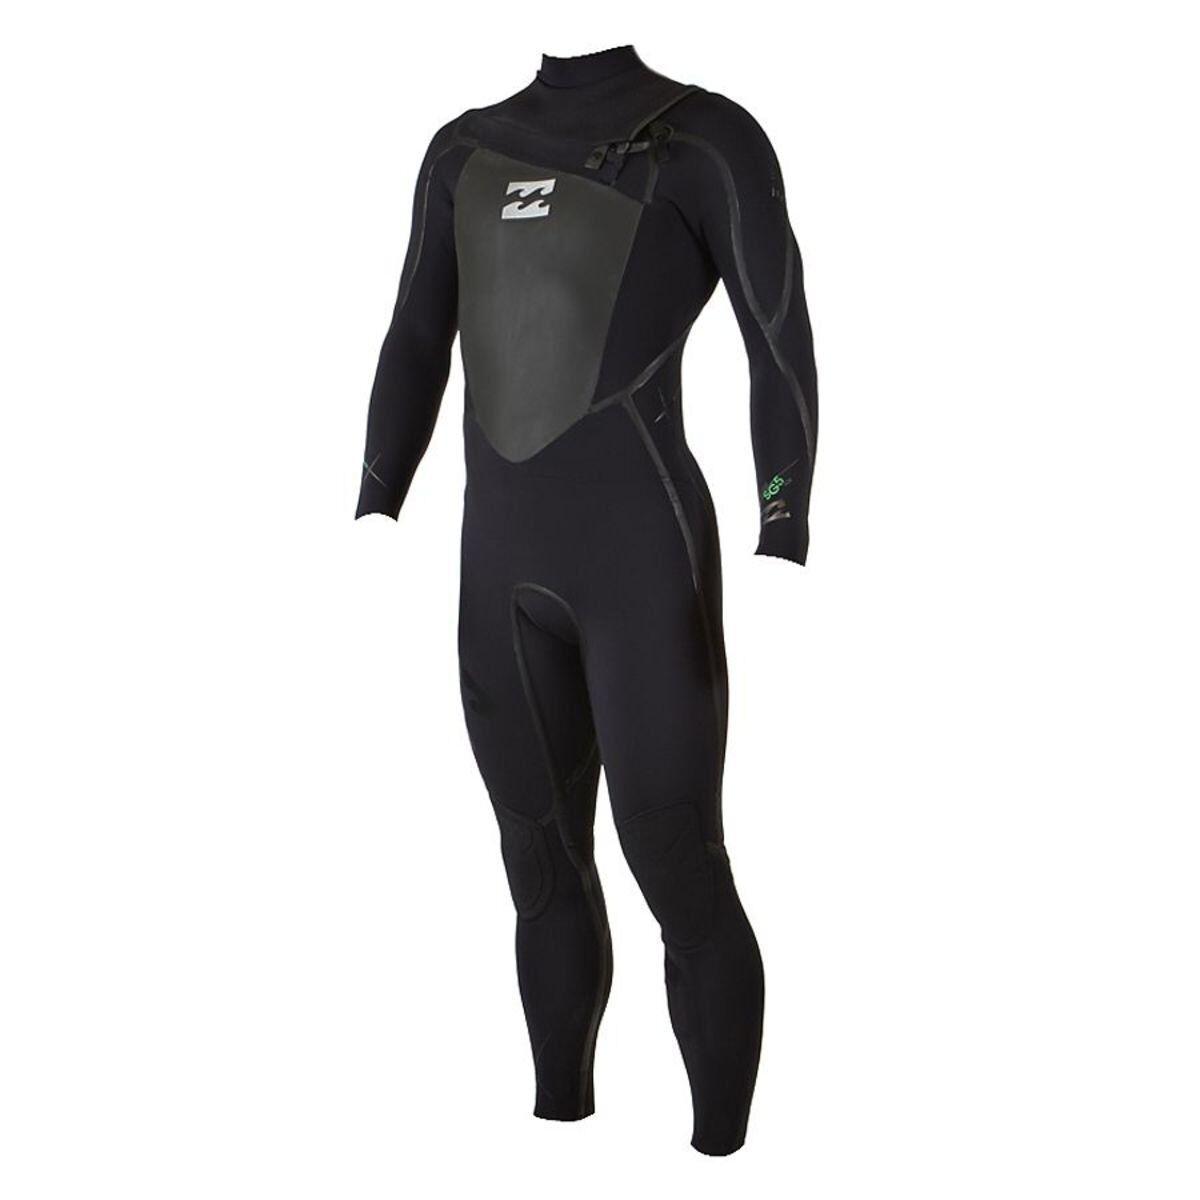 Billabong Solution SG5 CHEST ZIP 5mm Full Wetsuit Size Large Short LS F45M03